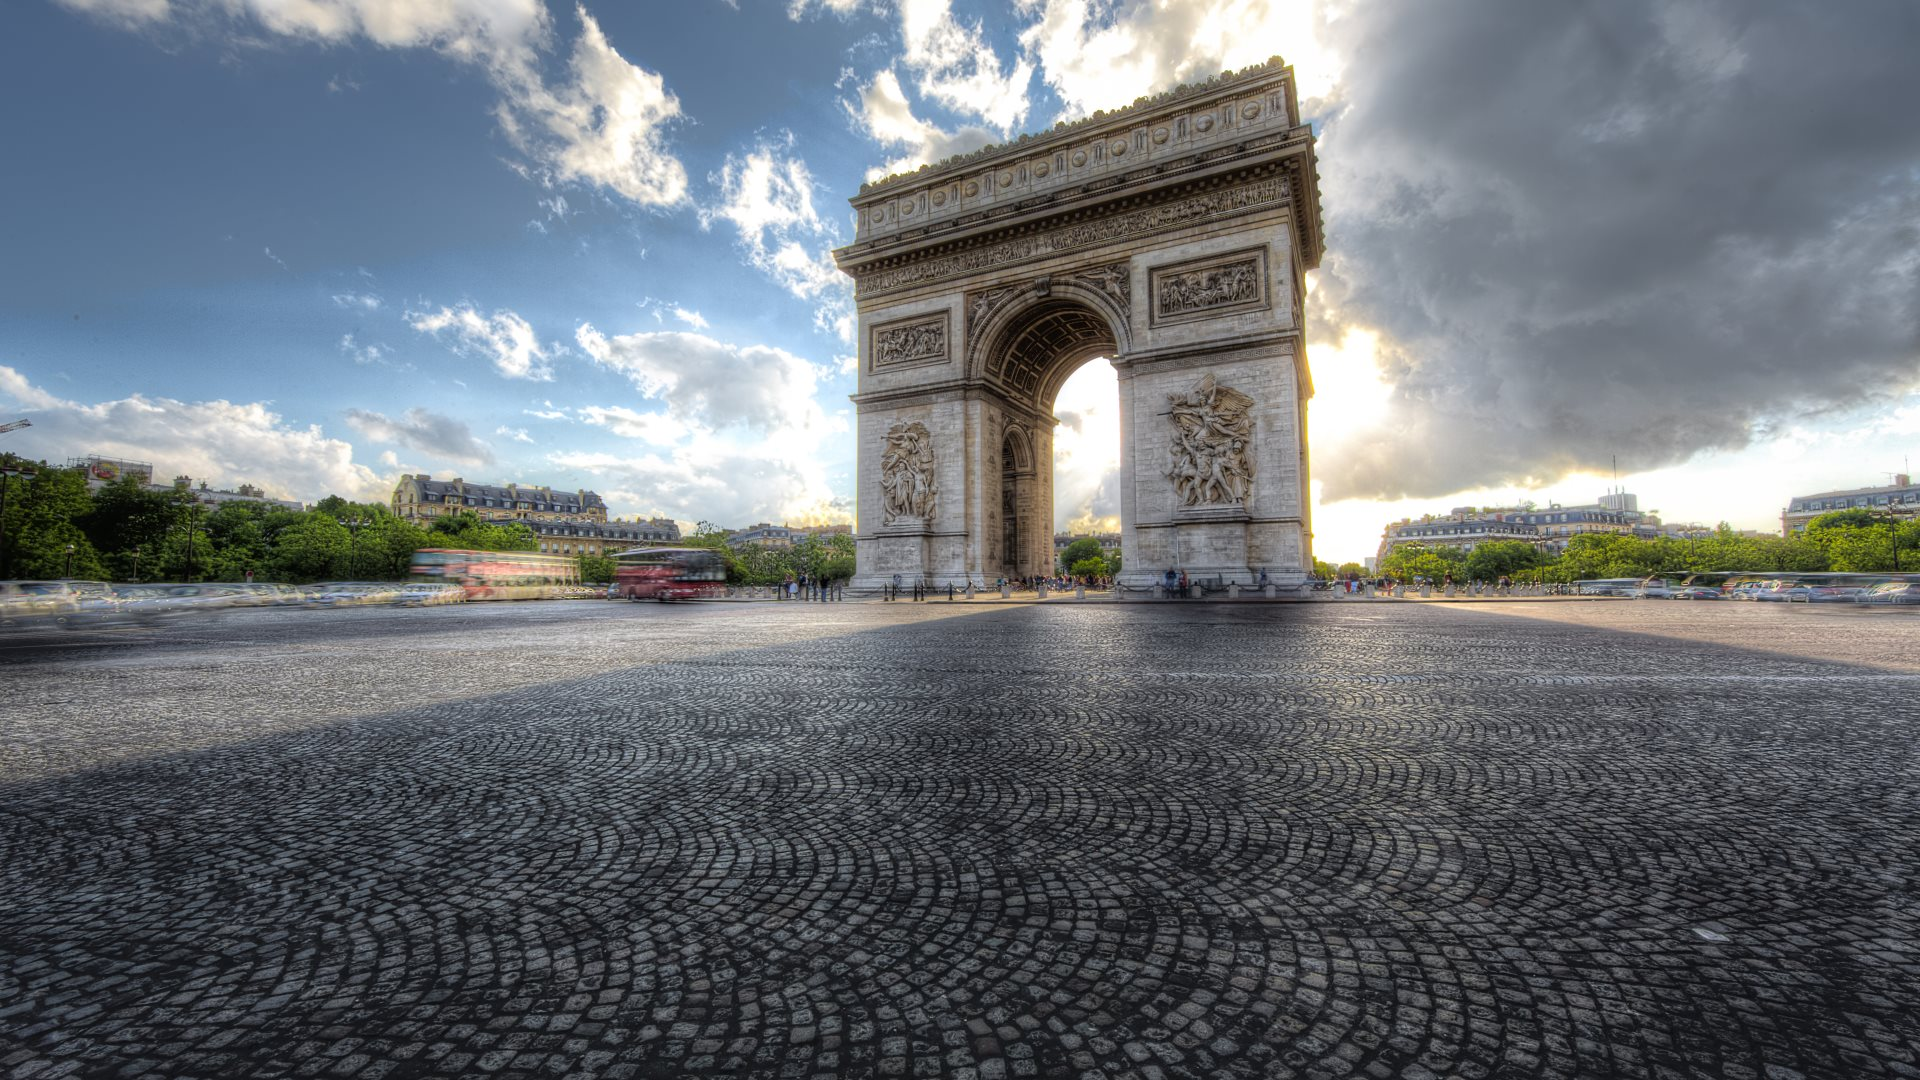 arc de triomphe hd - photo #14